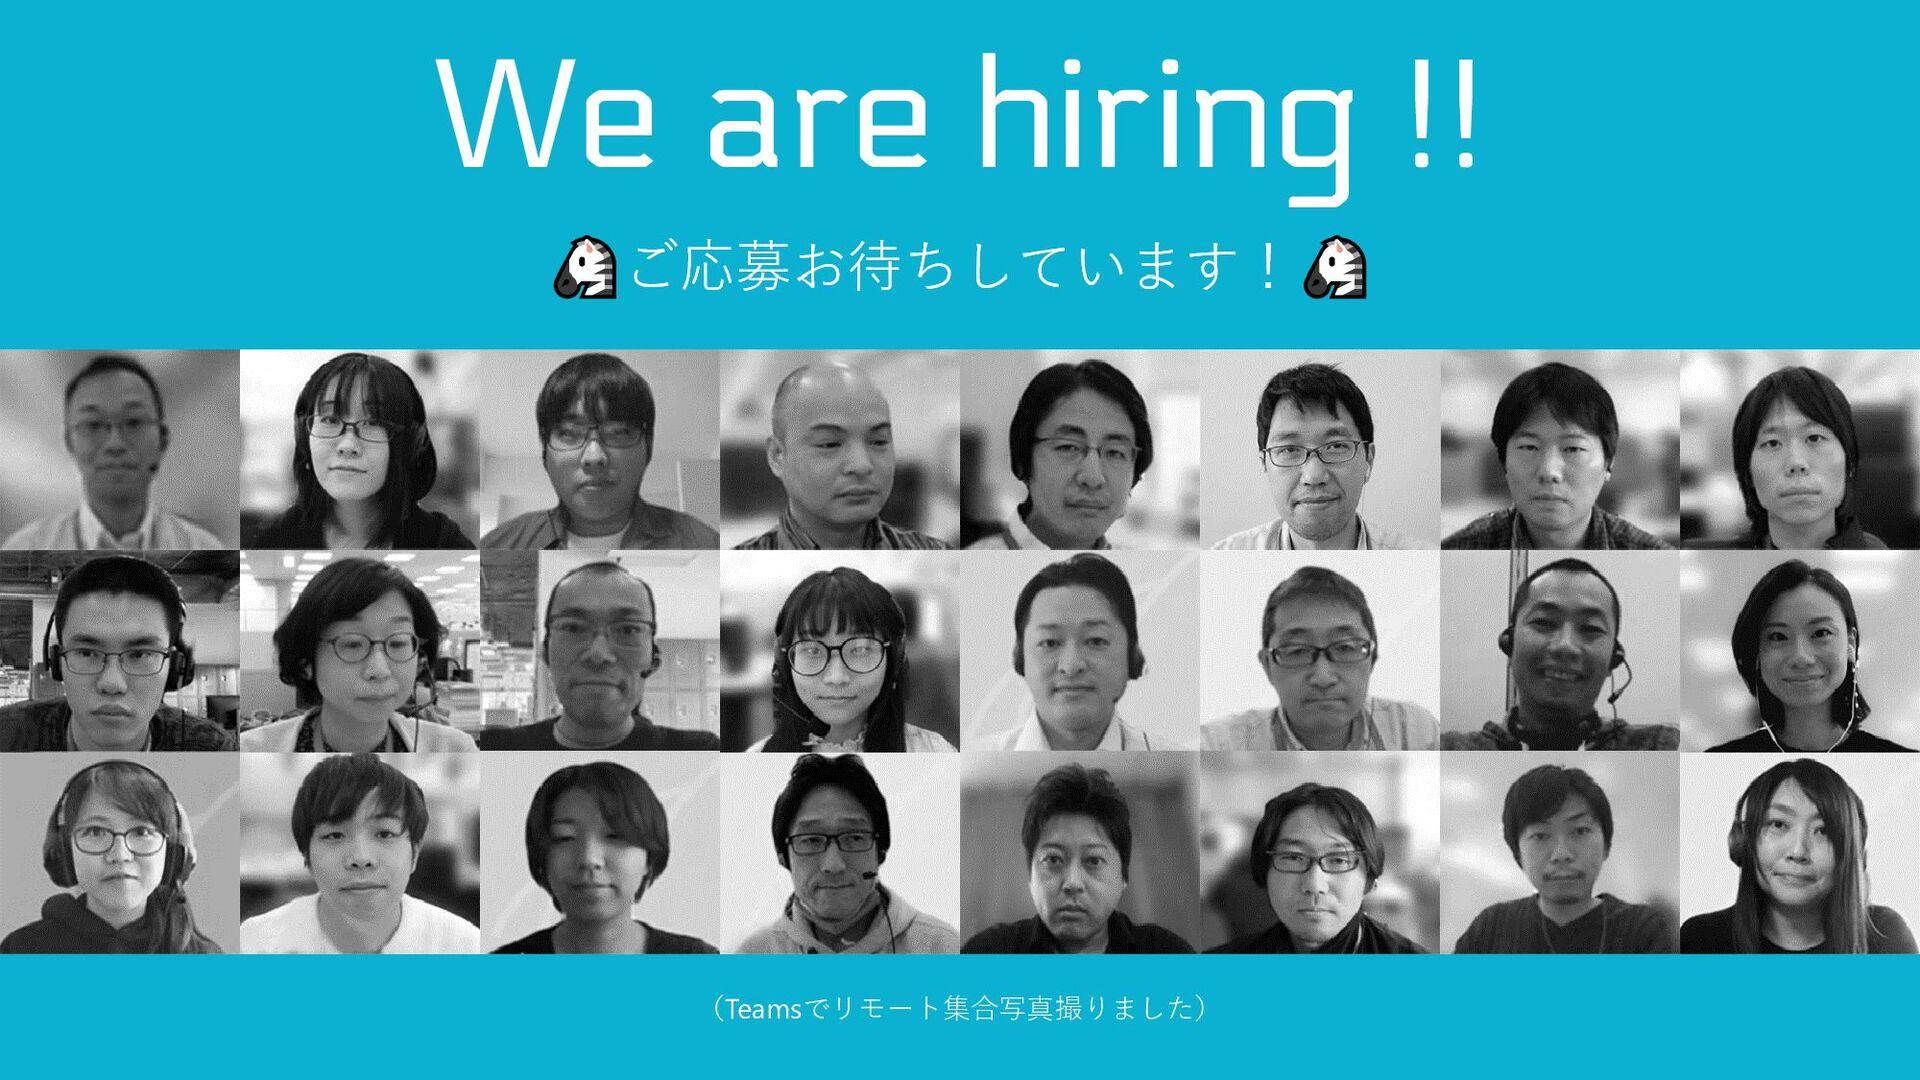 We are hiring !! (Teamsでリモート集合写真撮りました)